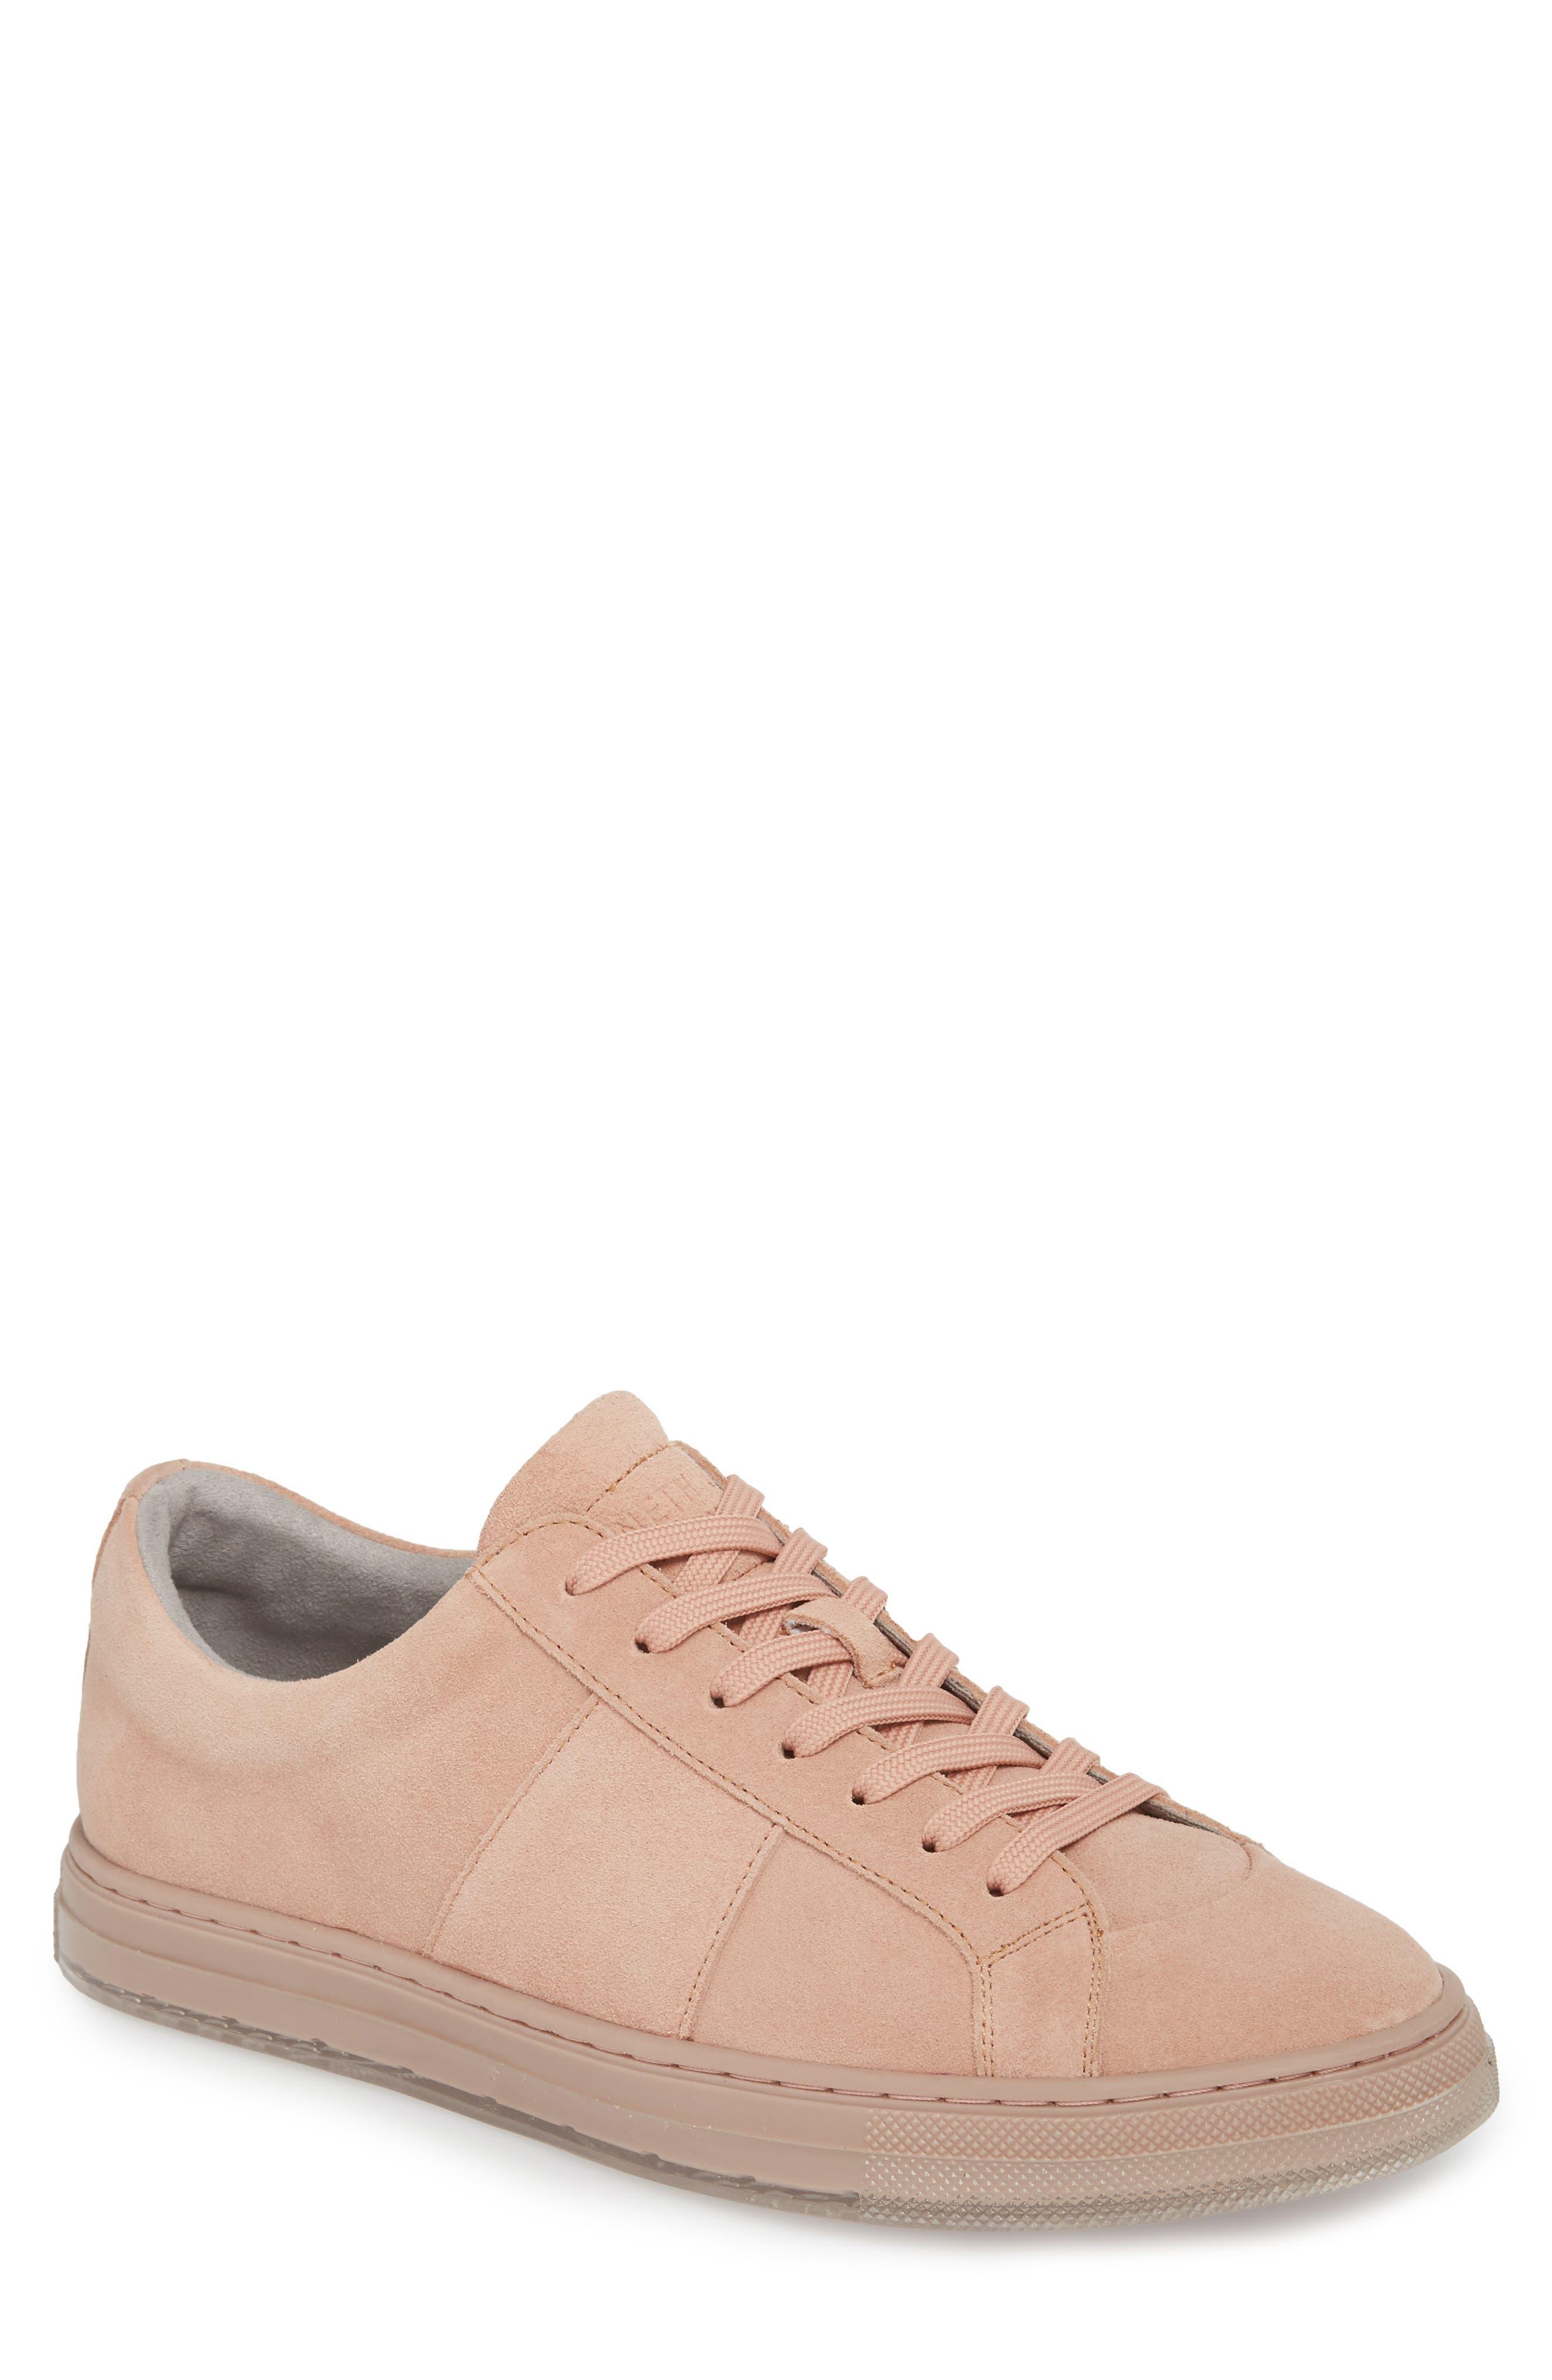 Colvin Sneaker,                             Main thumbnail 1, color,                             Rose Suede